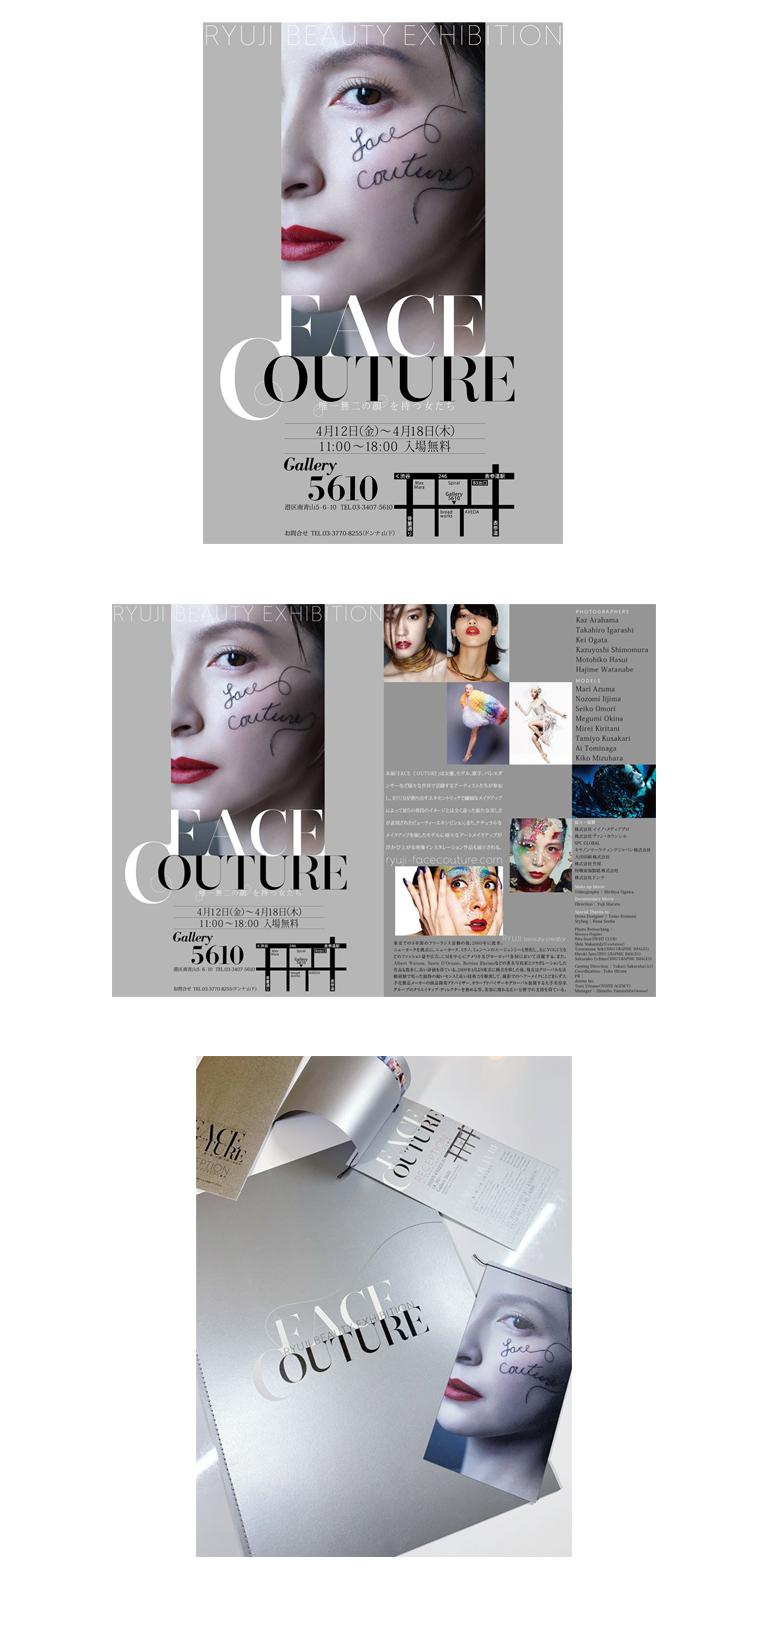 04_exhibition_ryuji_2